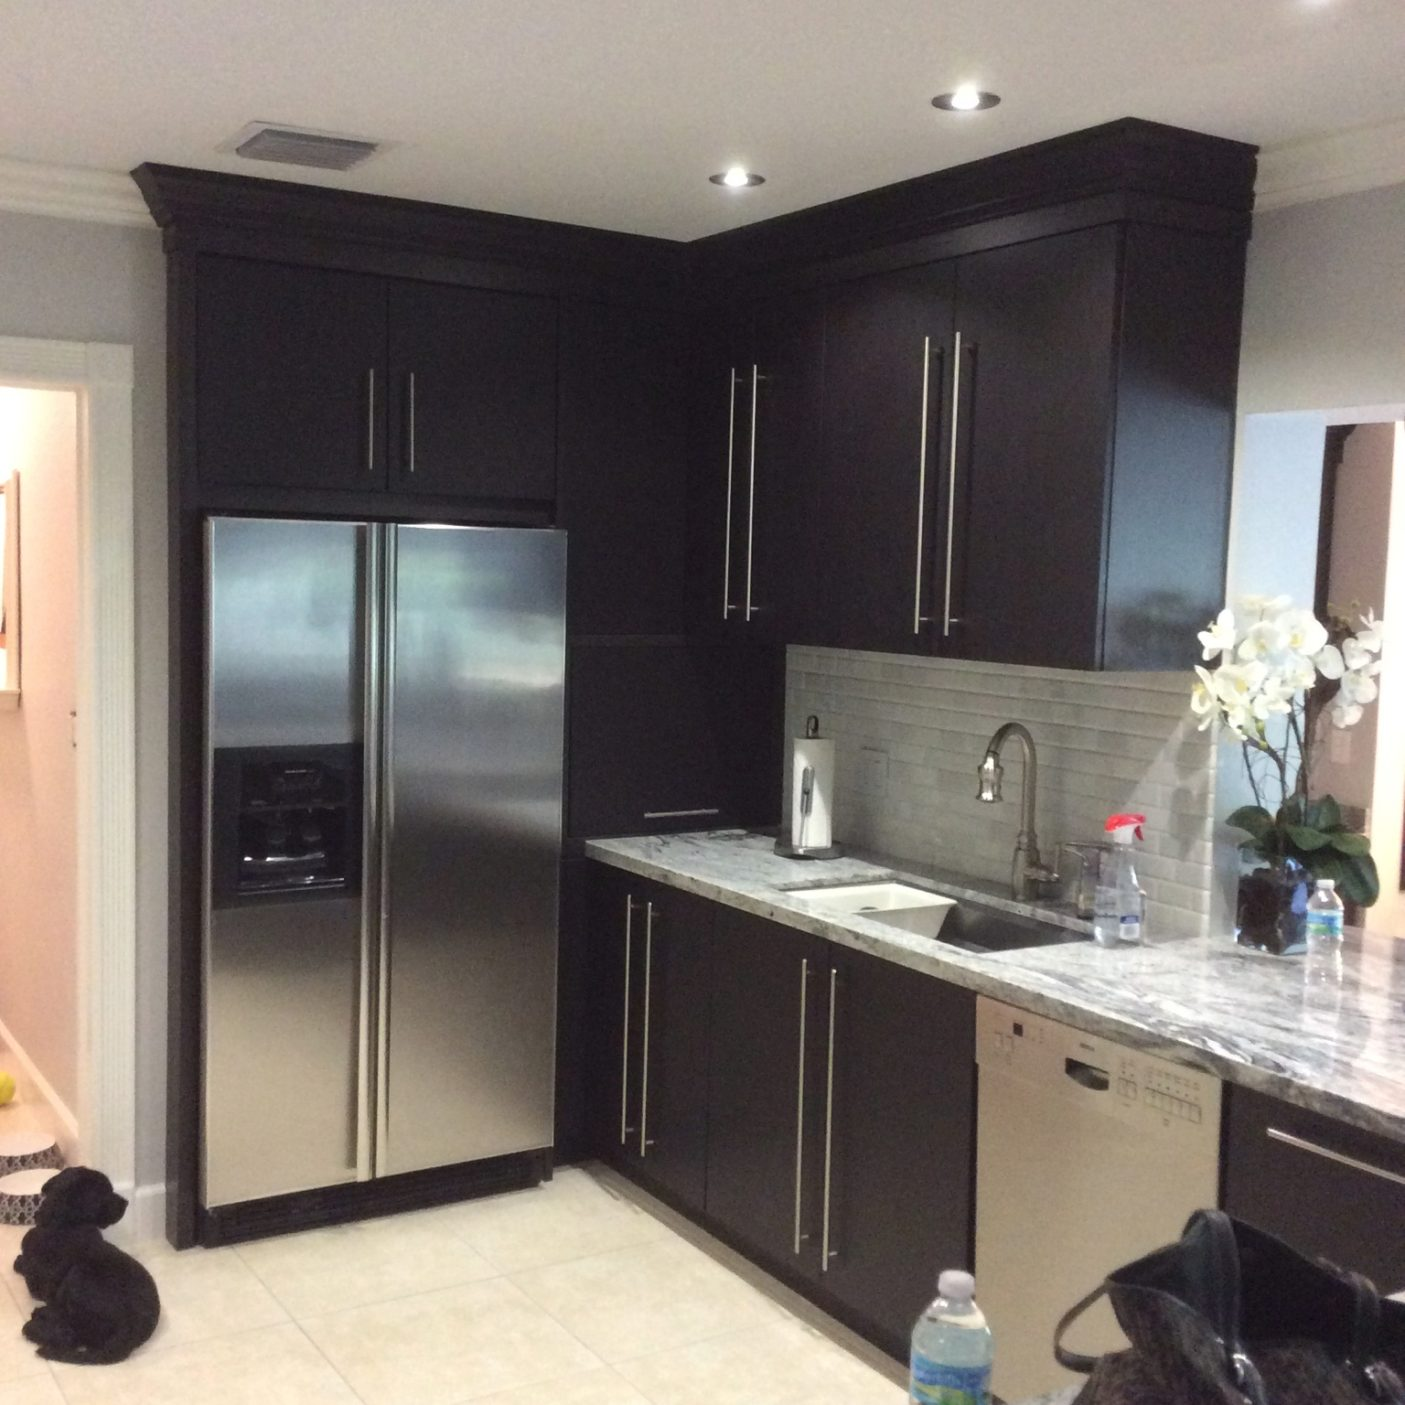 Kitchens-112.jpg